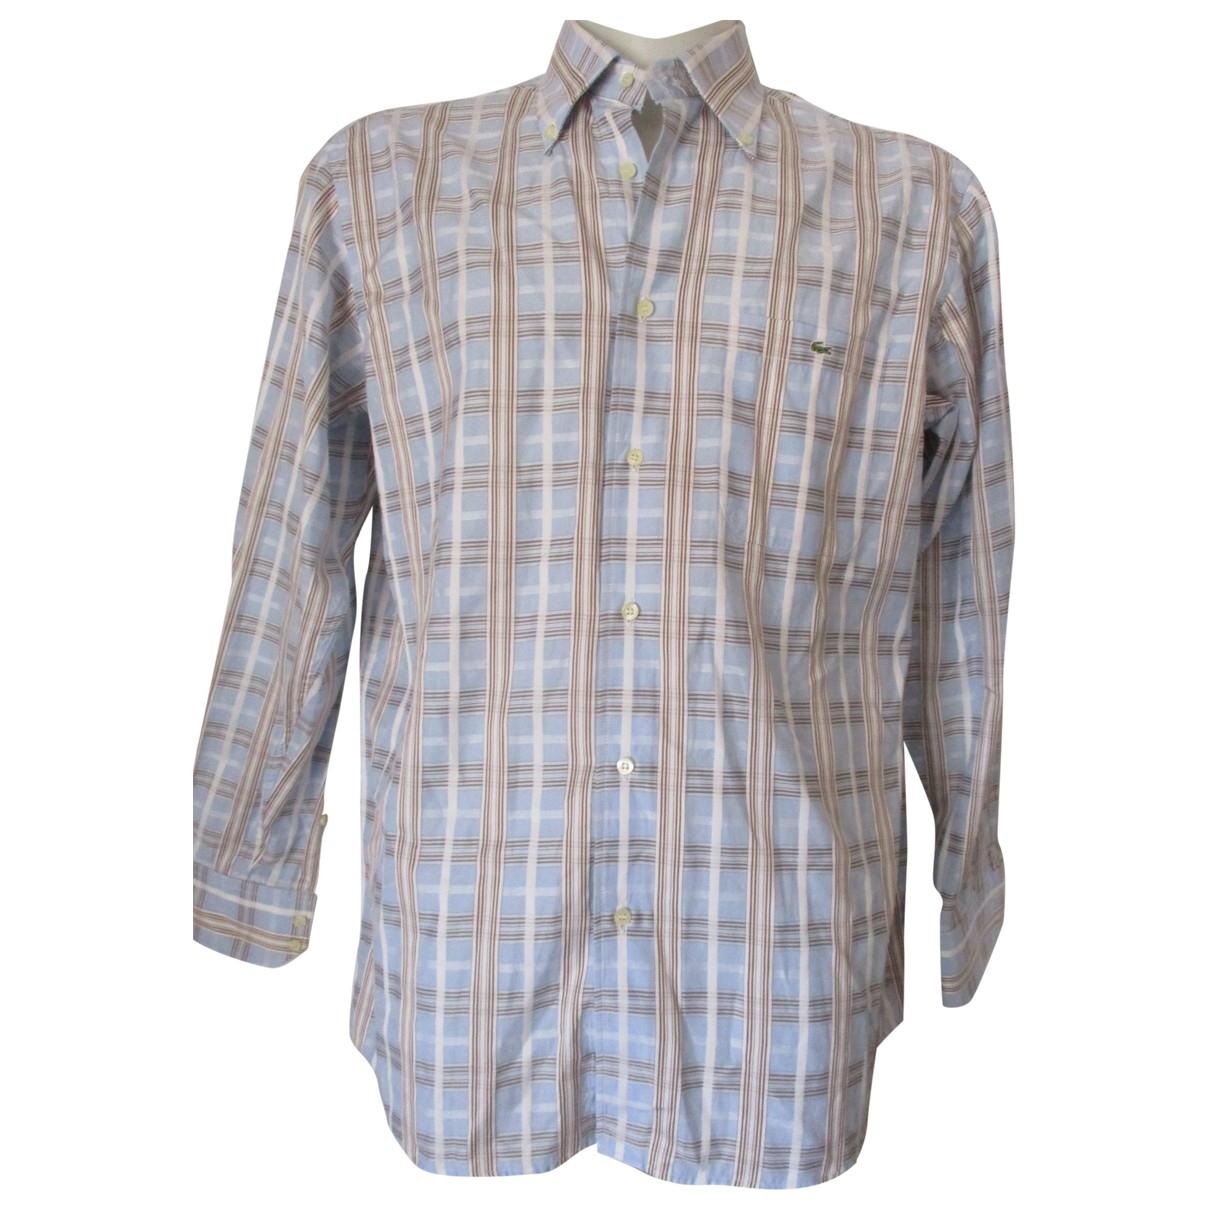 Lacoste \N Cotton Shirts for Men 42 EU (tour de cou / collar)